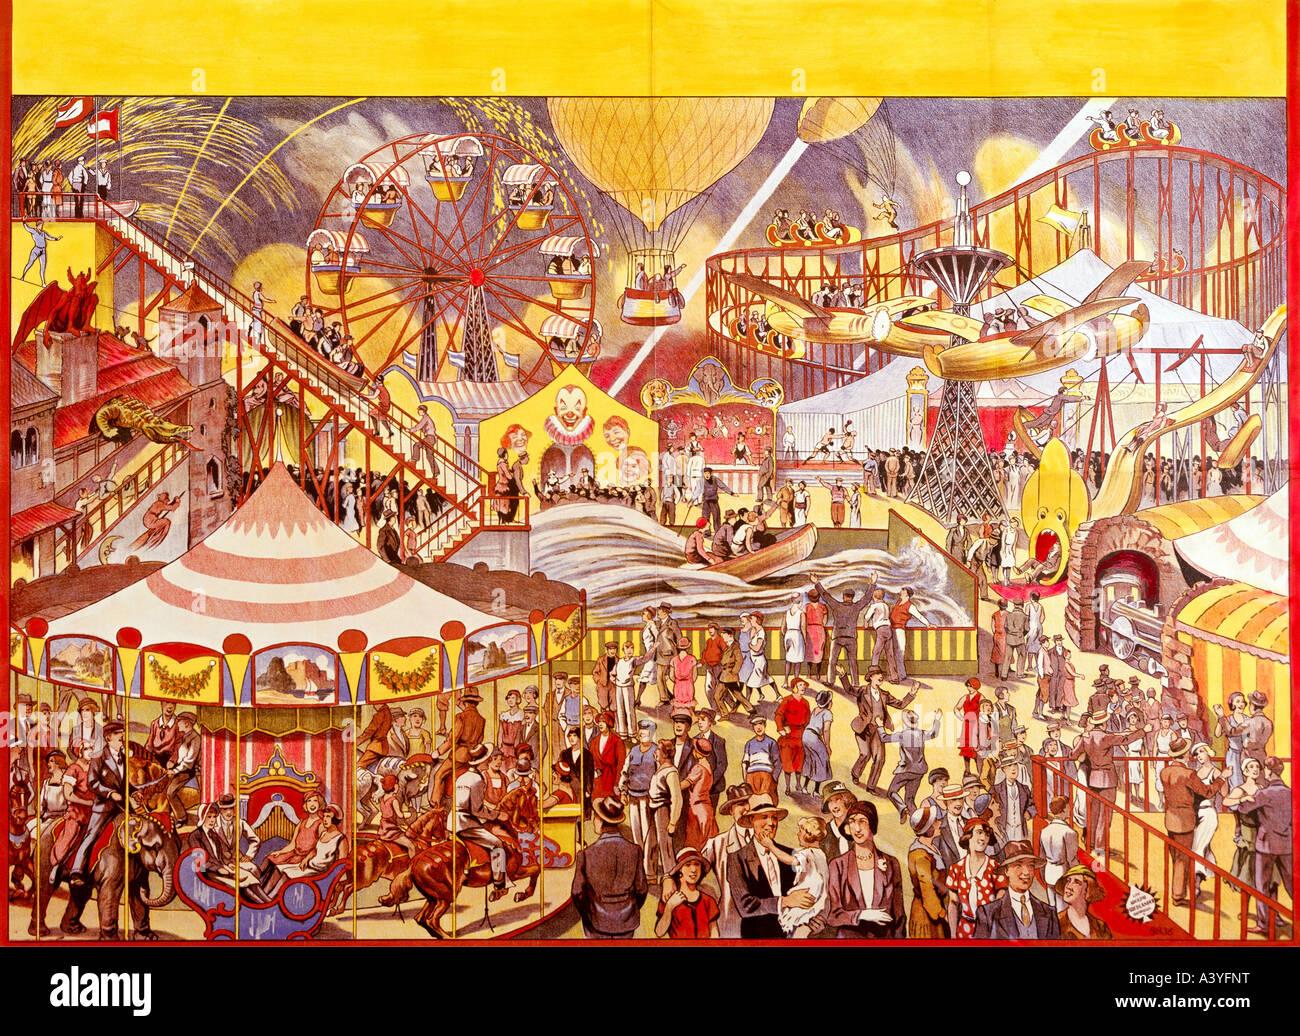 festivity, fairs, fairground with carousel, roller coaster and ...